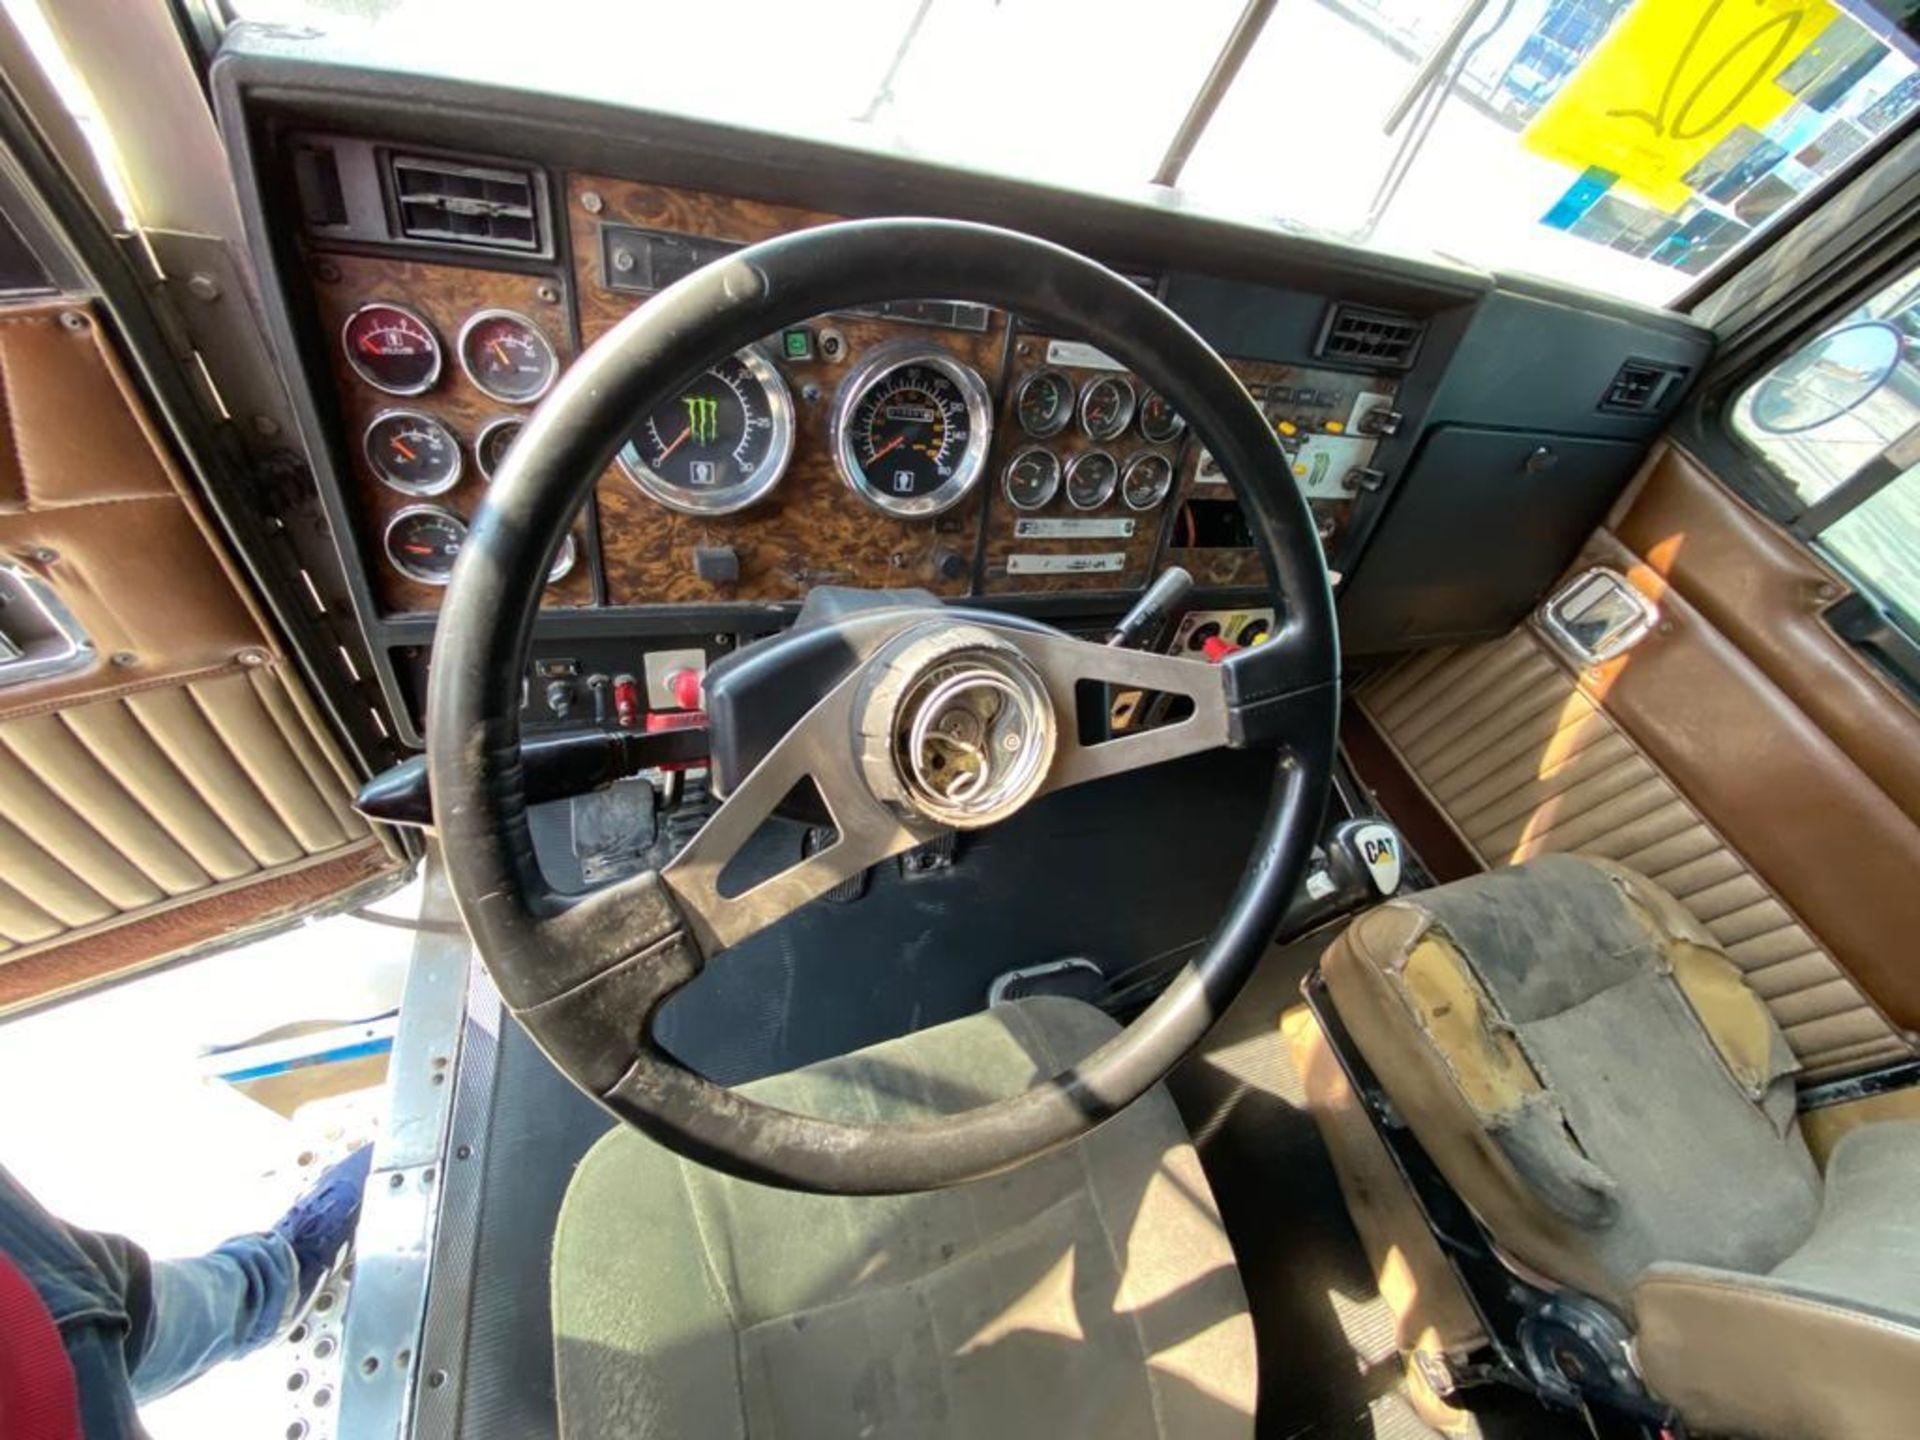 1999 Kenworth Sleeper truck tractor, standard transmission of 18 speeds - Image 48 of 75